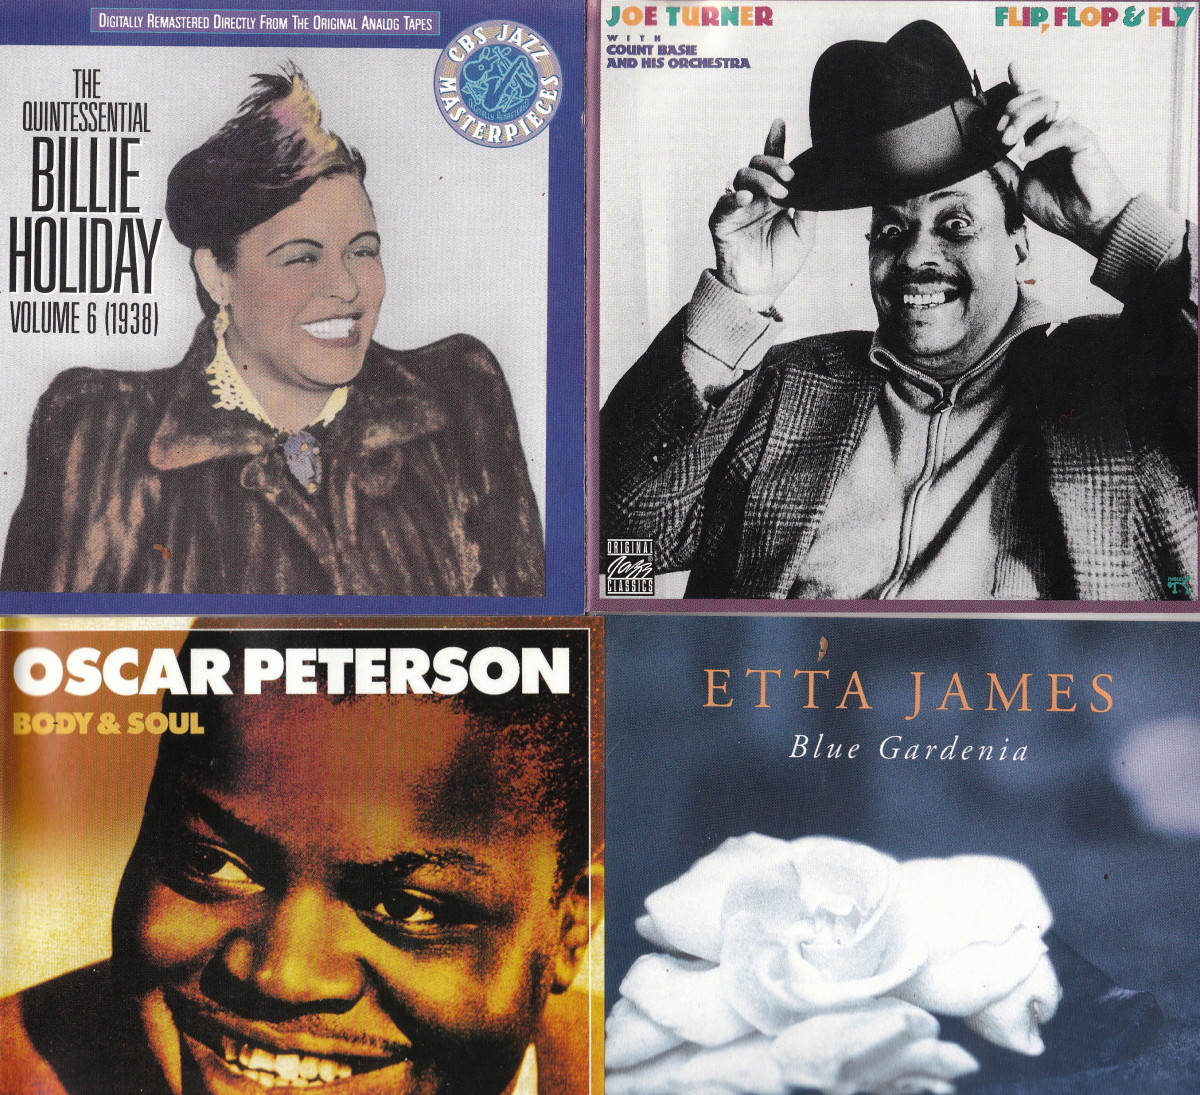 Clockwsie: Billie Holiday; Joe Turner; Oscar Peterson; Etta James